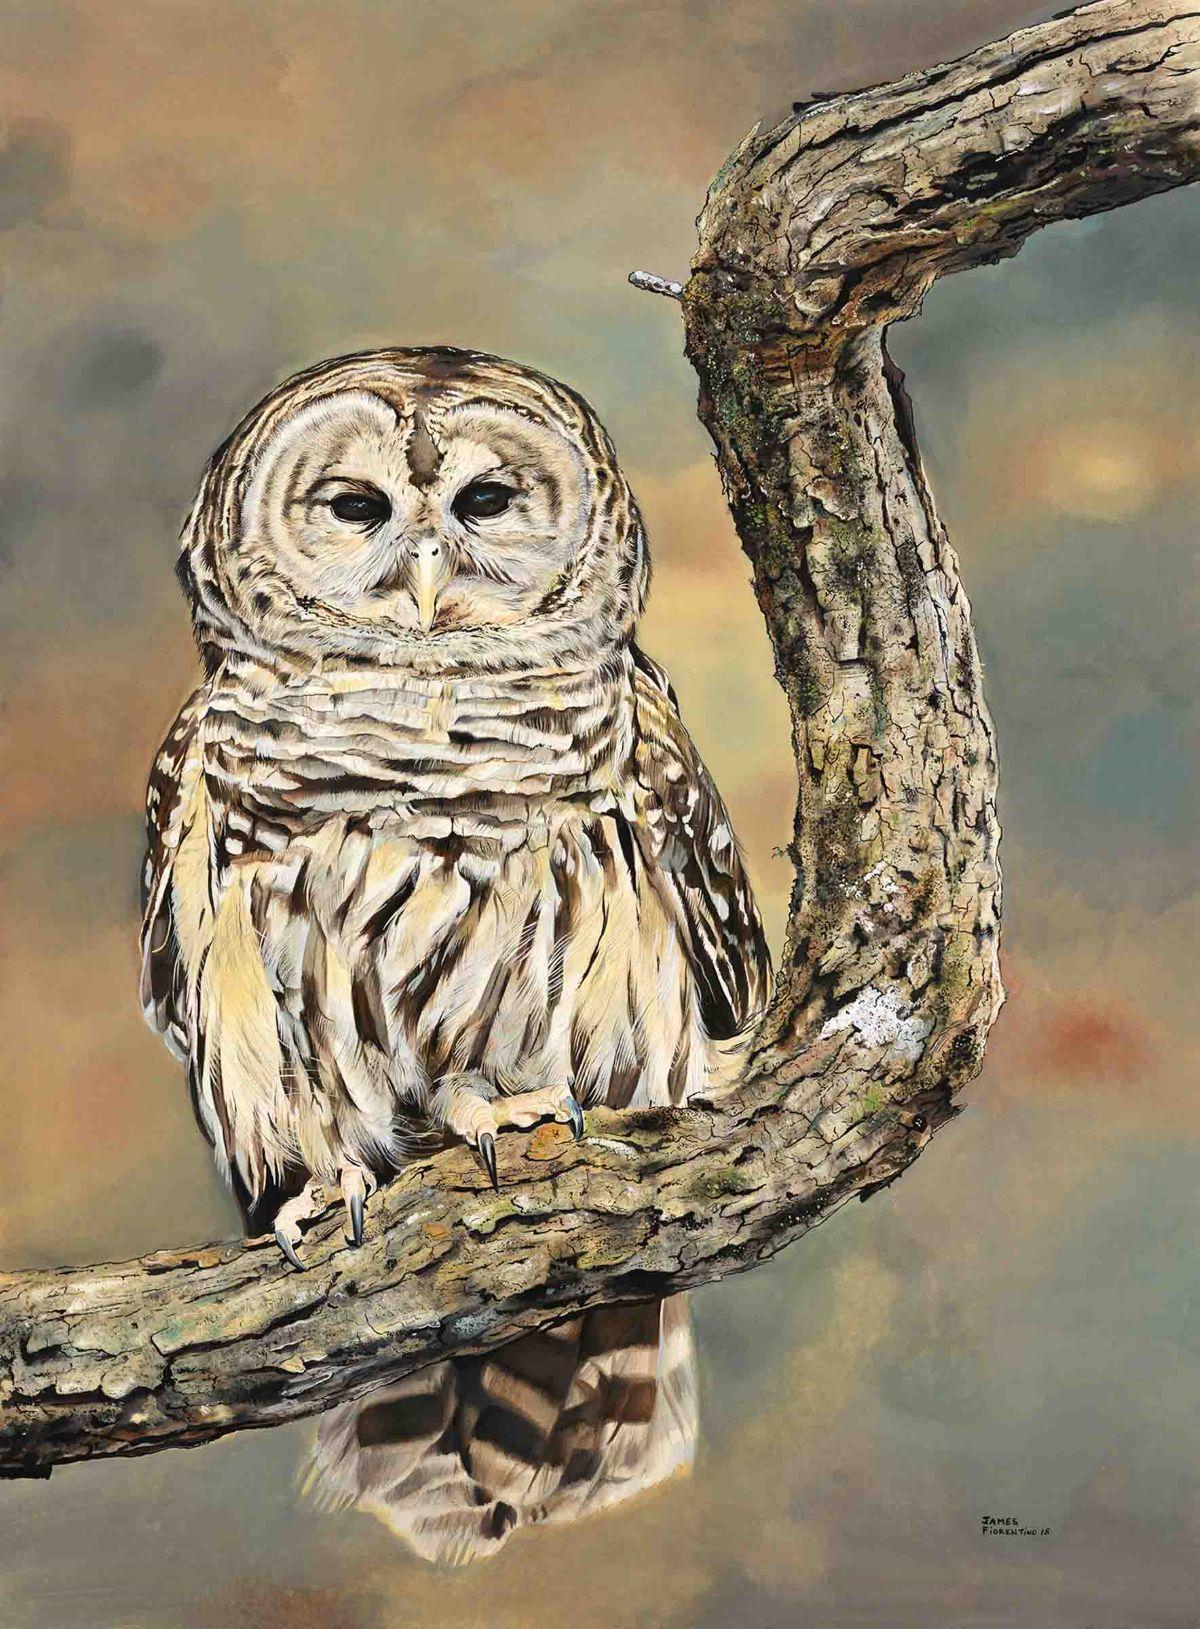 Hunterdon artist James Fiorentino places in New Jersey Highlands Coalition juried art exhibit